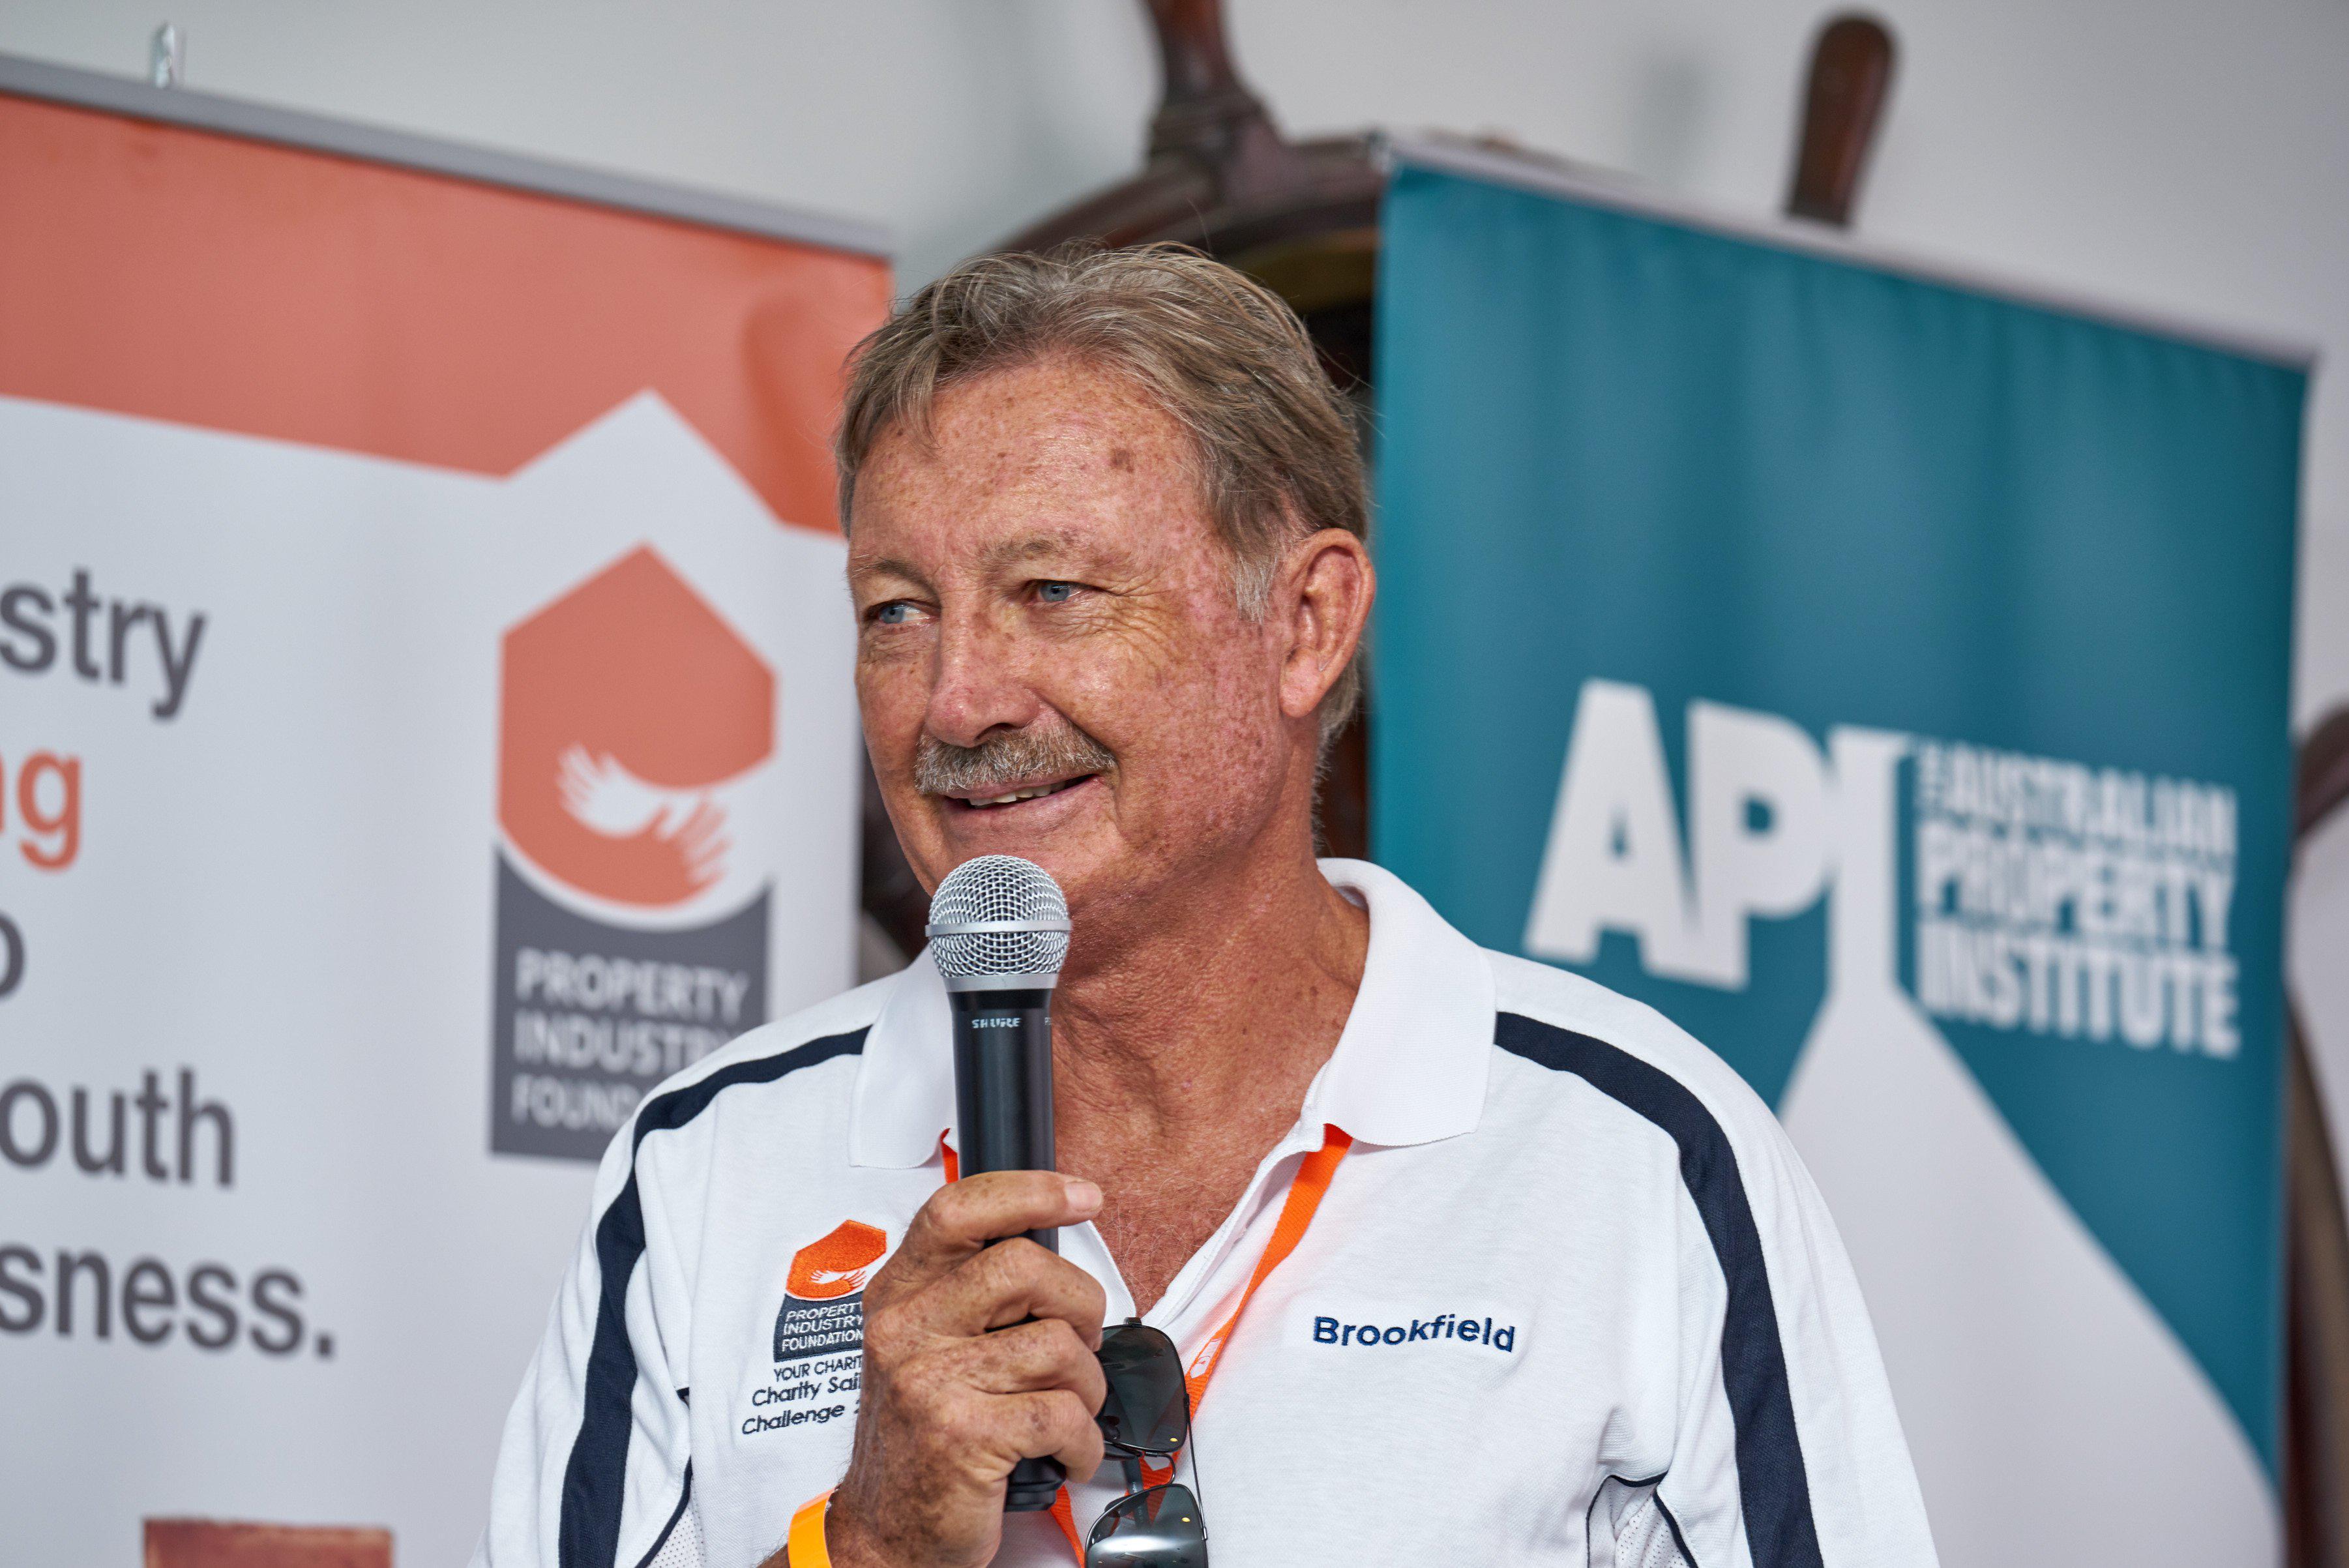 John-Bertrand-AON-President-and-Americas-Cup-Winnings-Skipper.jpg